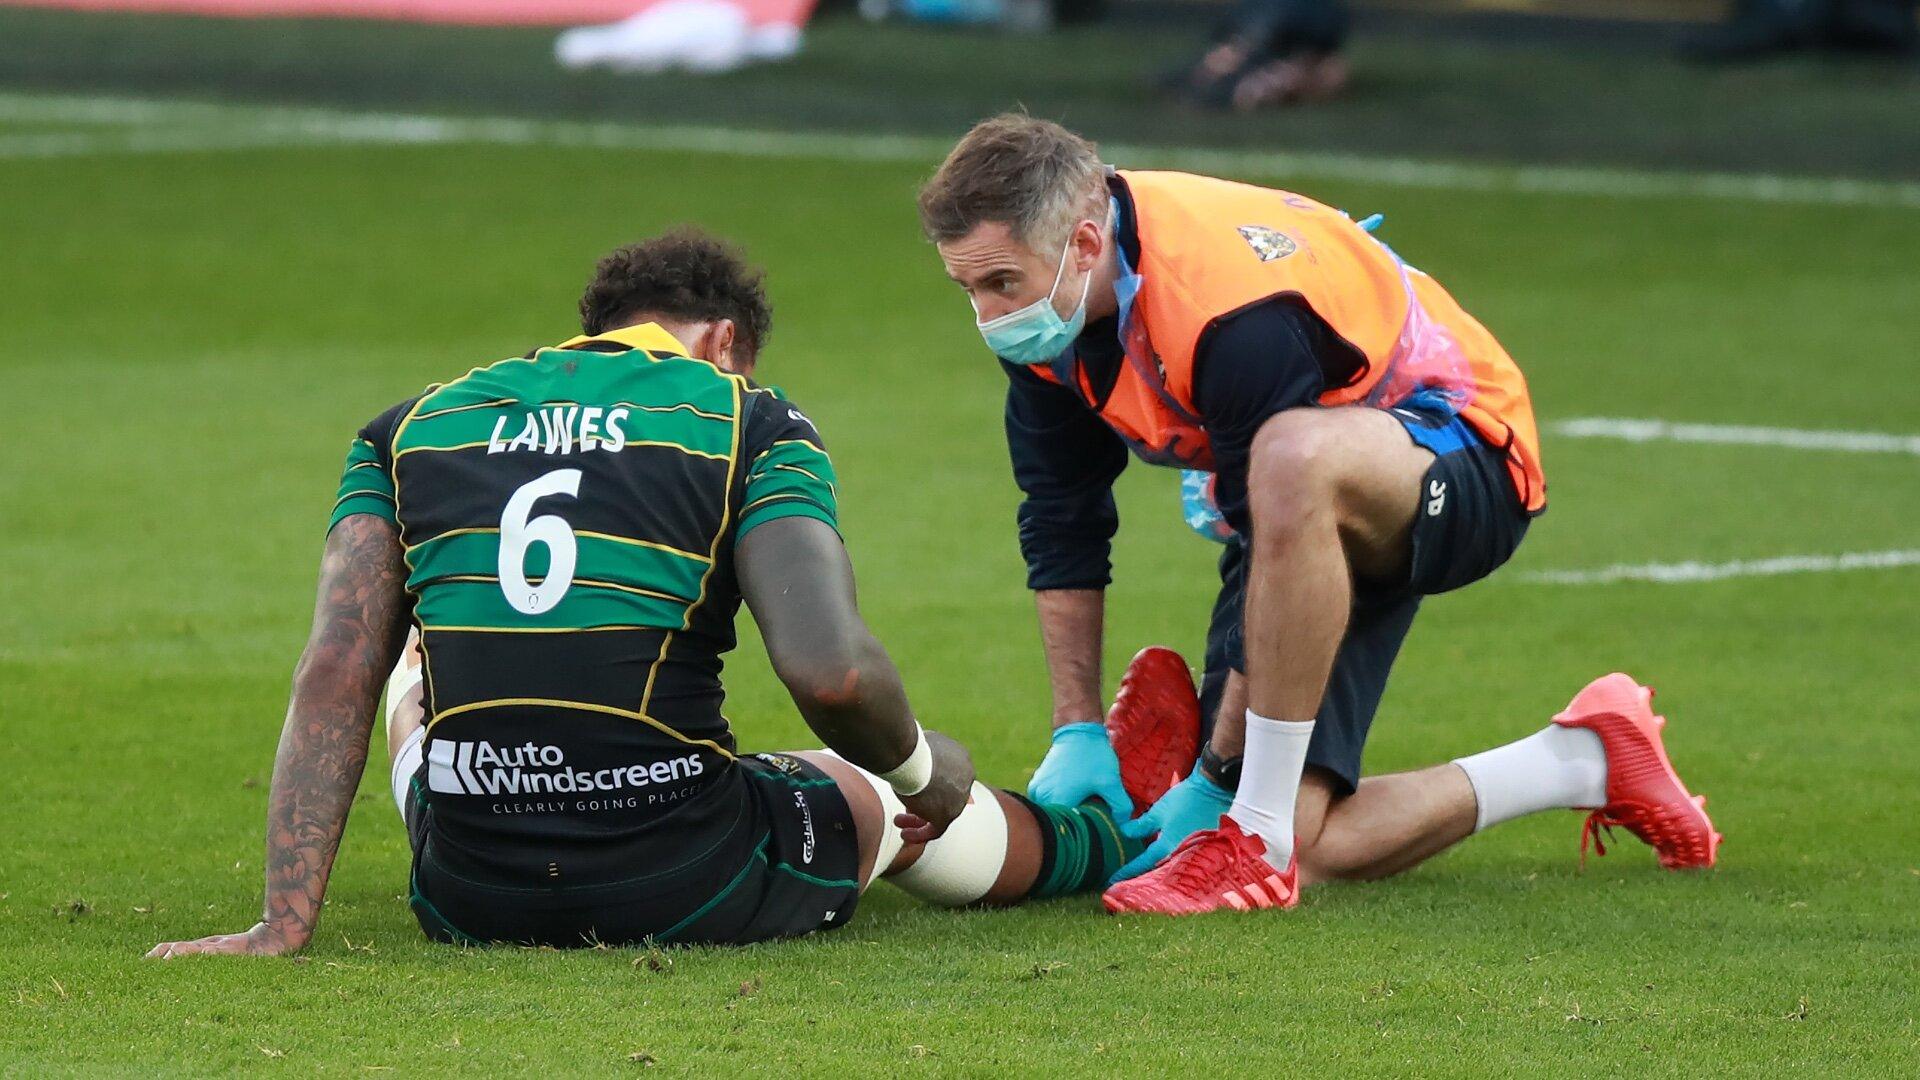 Northampton issue statement on Courtney Lawes' injury